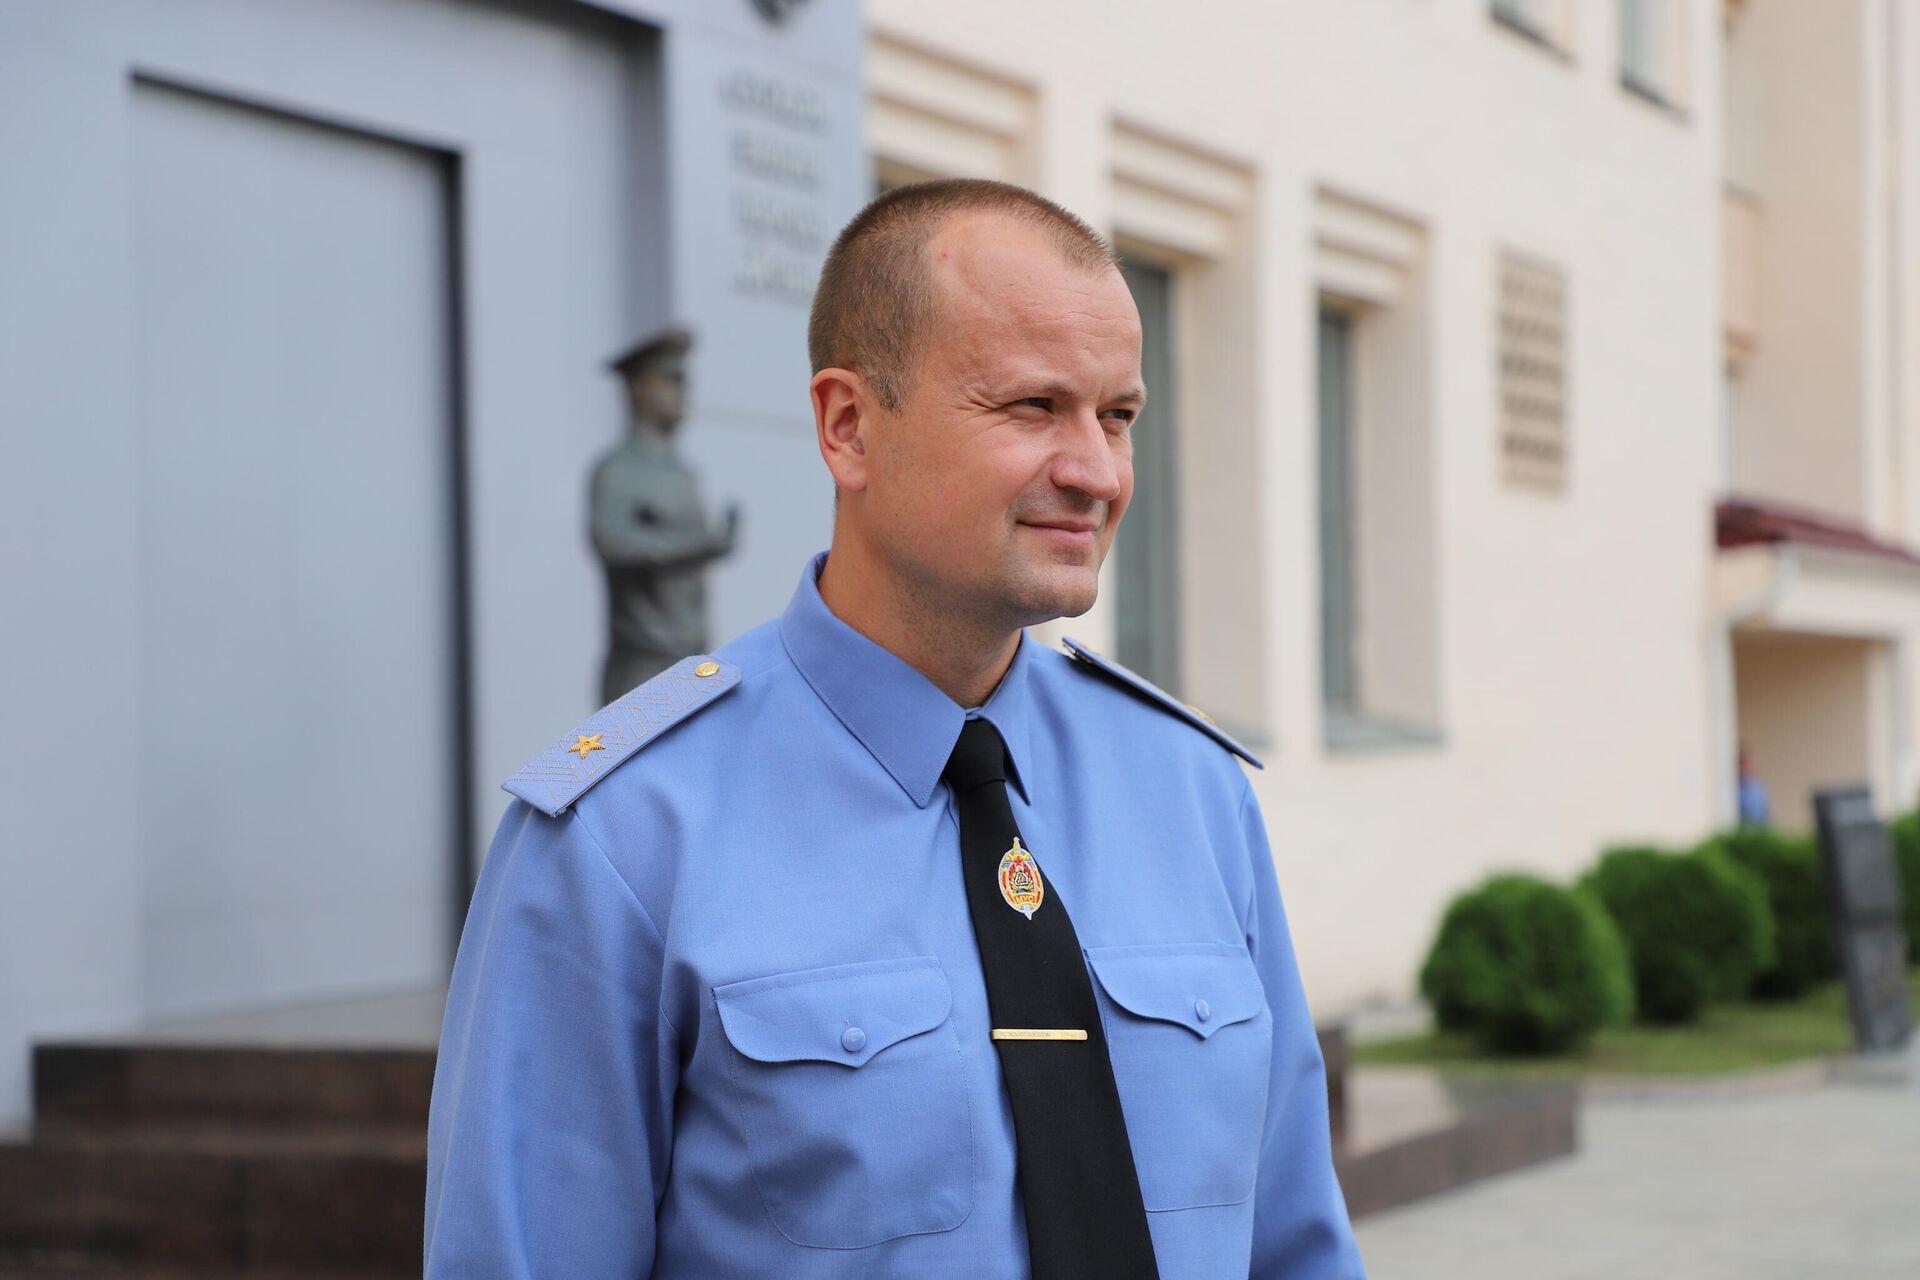 Генерал-майор милиции Александр Васильев - Sputnik Беларусь, 1920, 05.08.2021